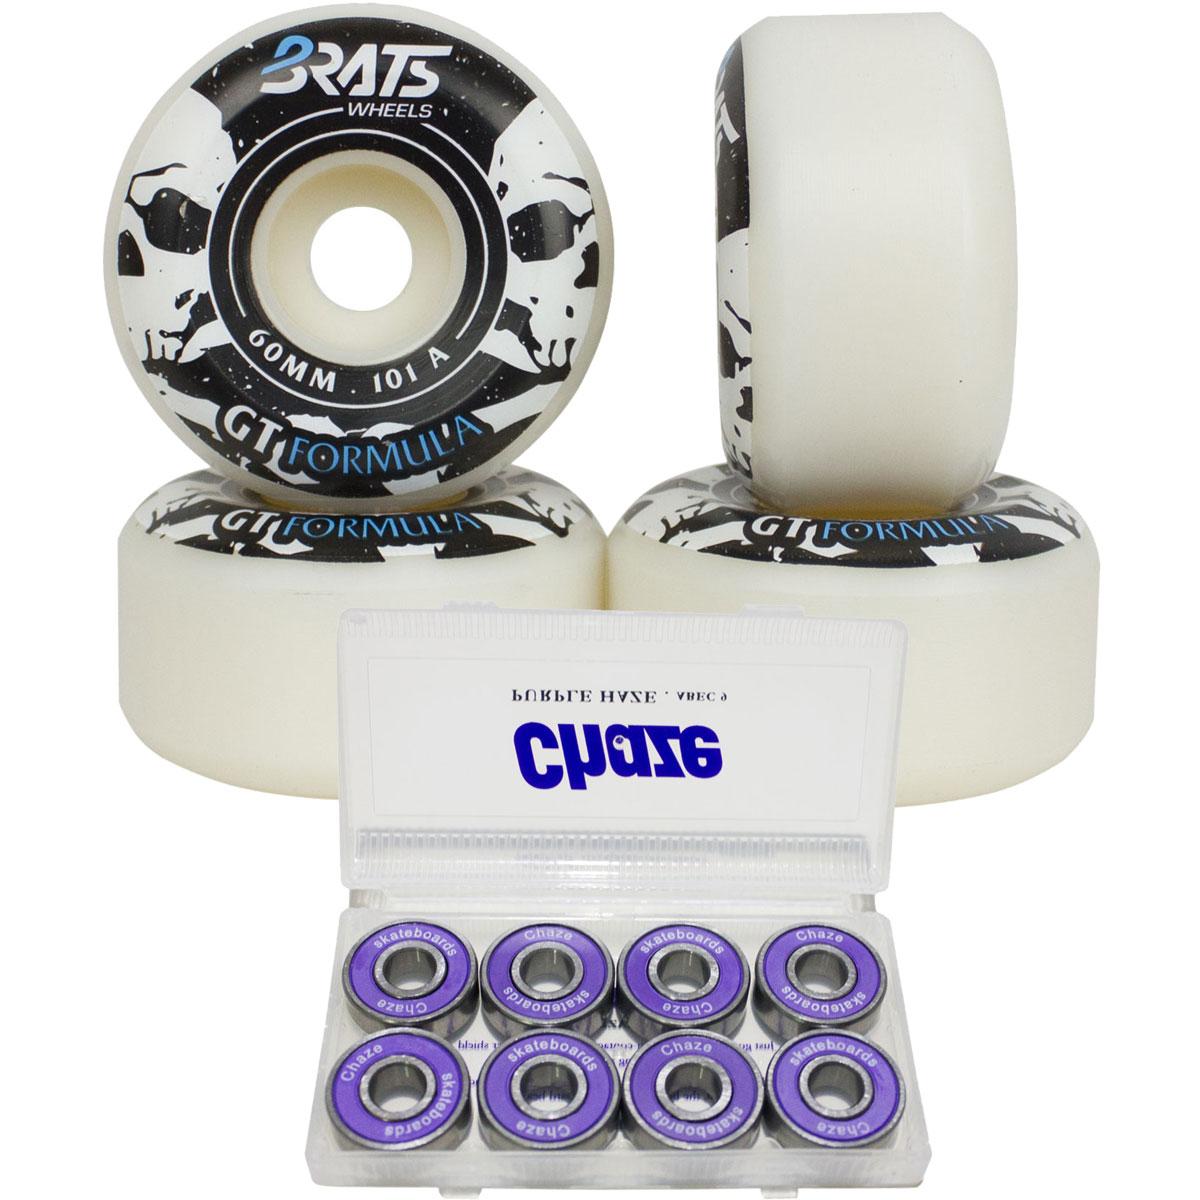 Roda Skate Brats Vertical Pro 101A 60mm e Rolamento Chaze